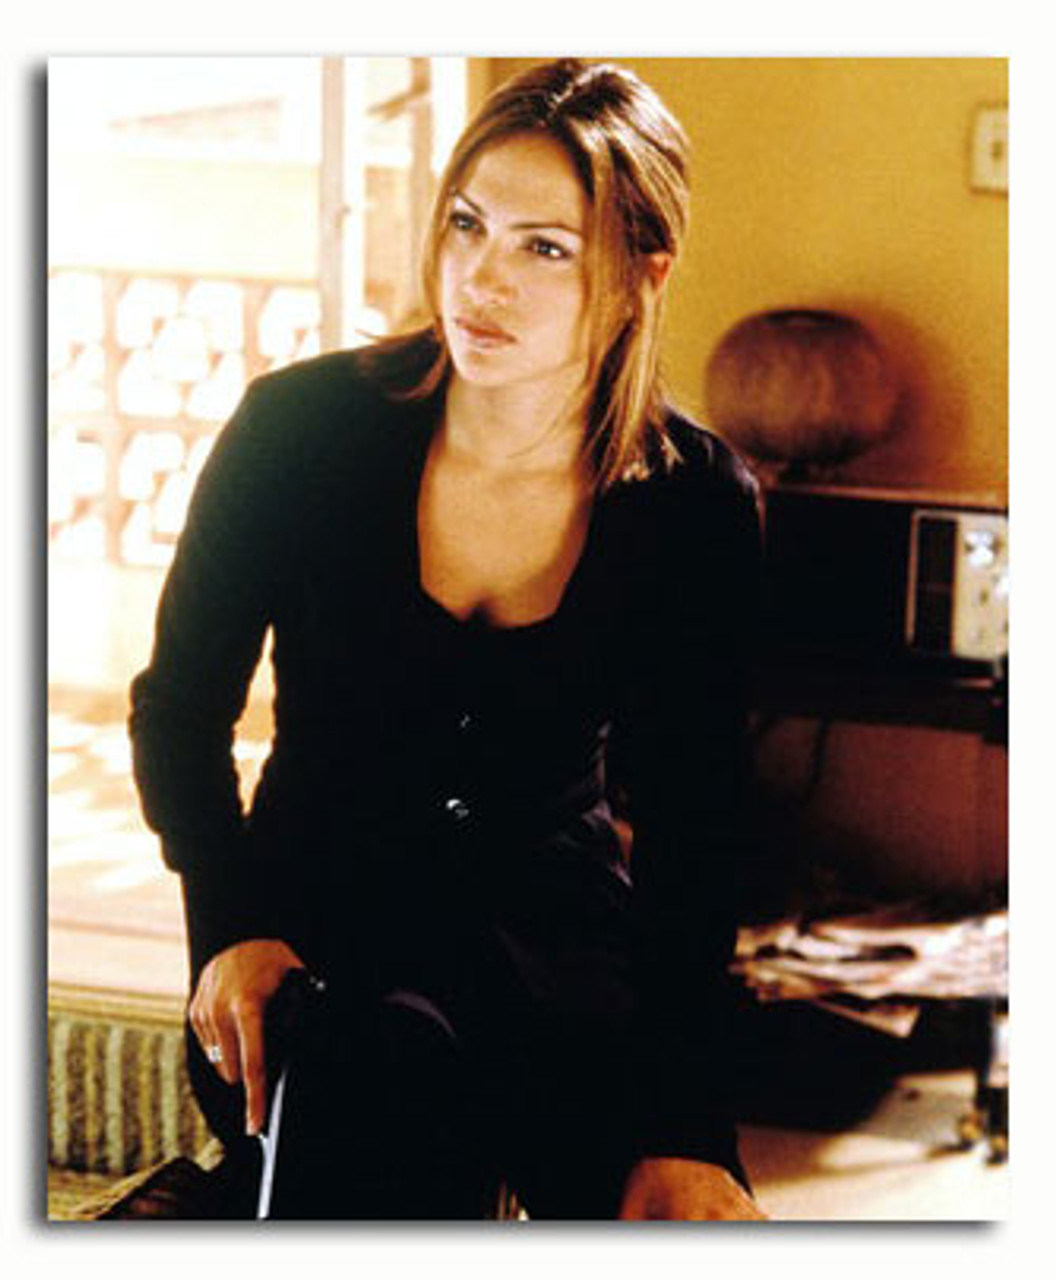 Pop Star Jennifer Lopez FC00258 Art Print Poster A4 A3 A2 A1